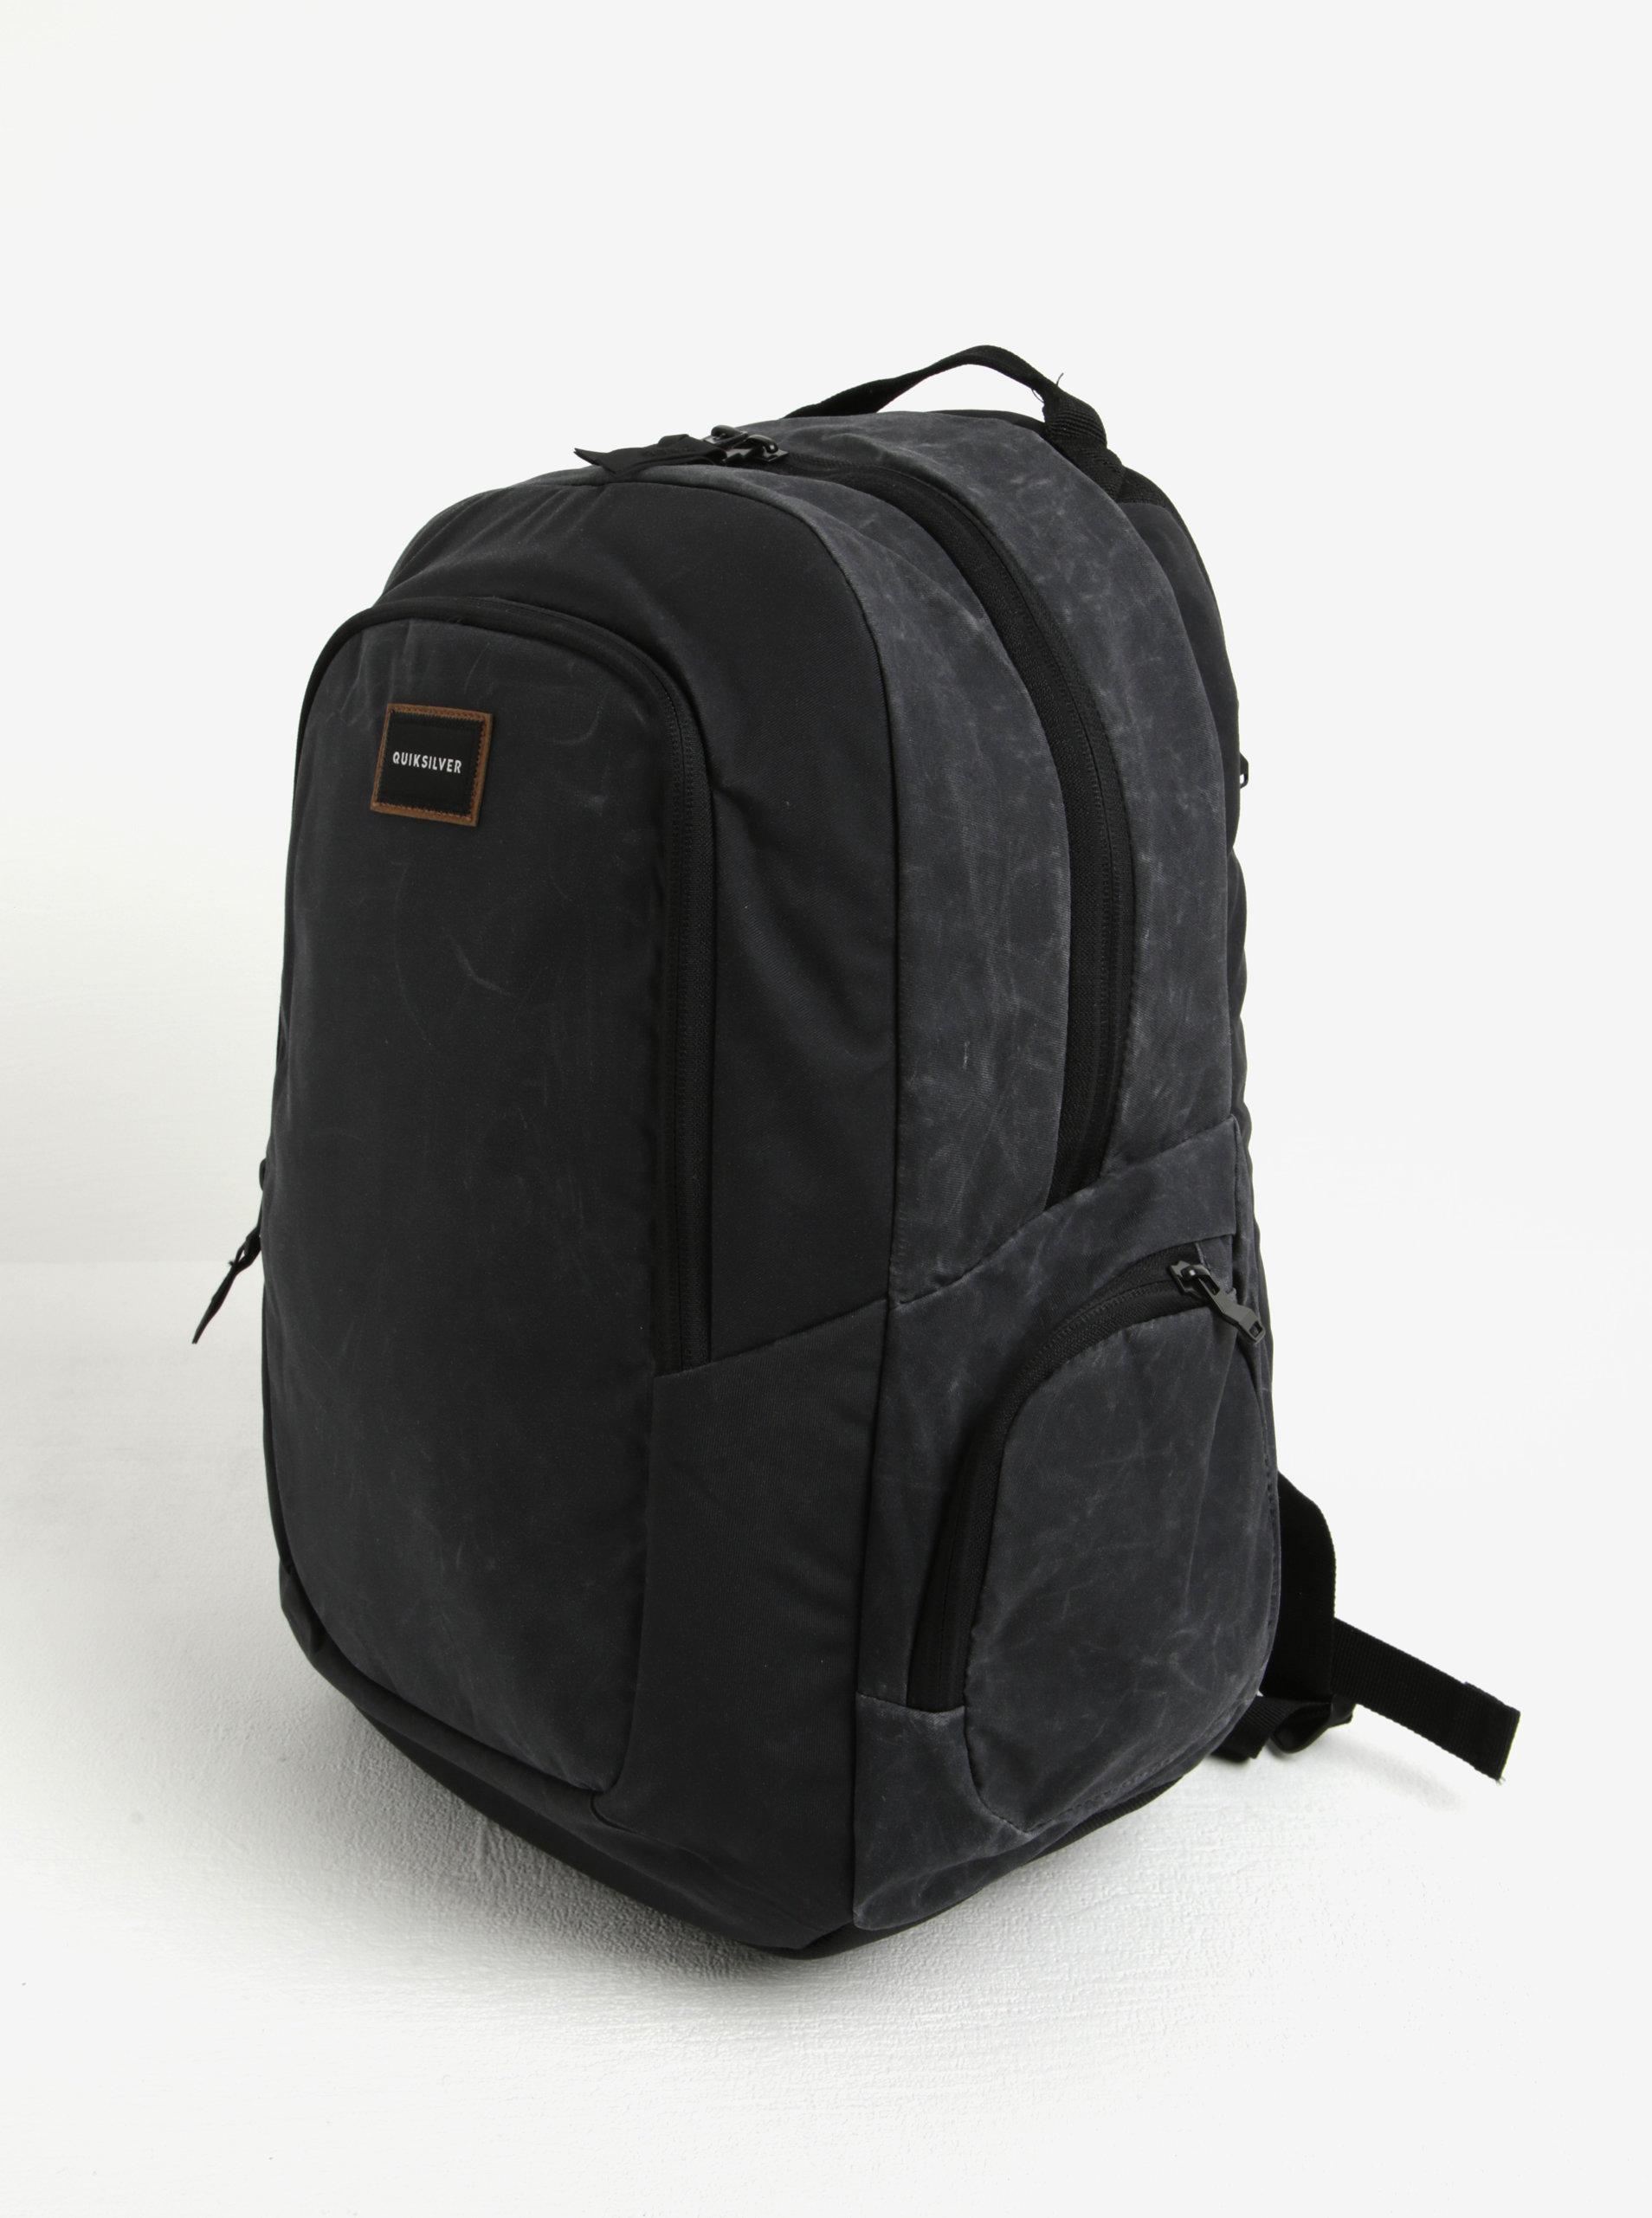 d4c3f7e3b5 Černý batoh Quiksilver 25l ...